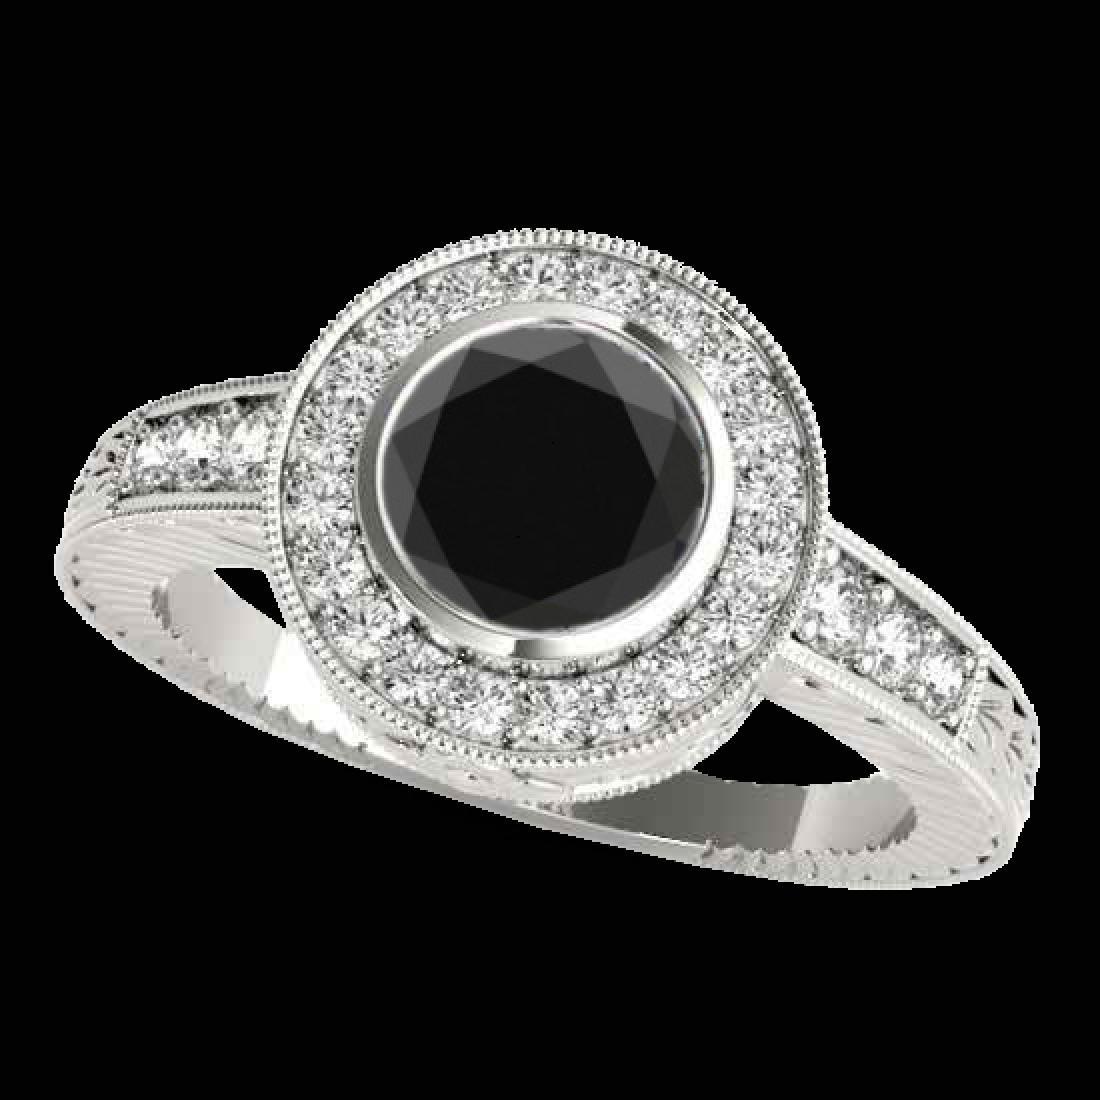 1.50 CTW Certified VS Black Diamond Solitaire Halo Ring